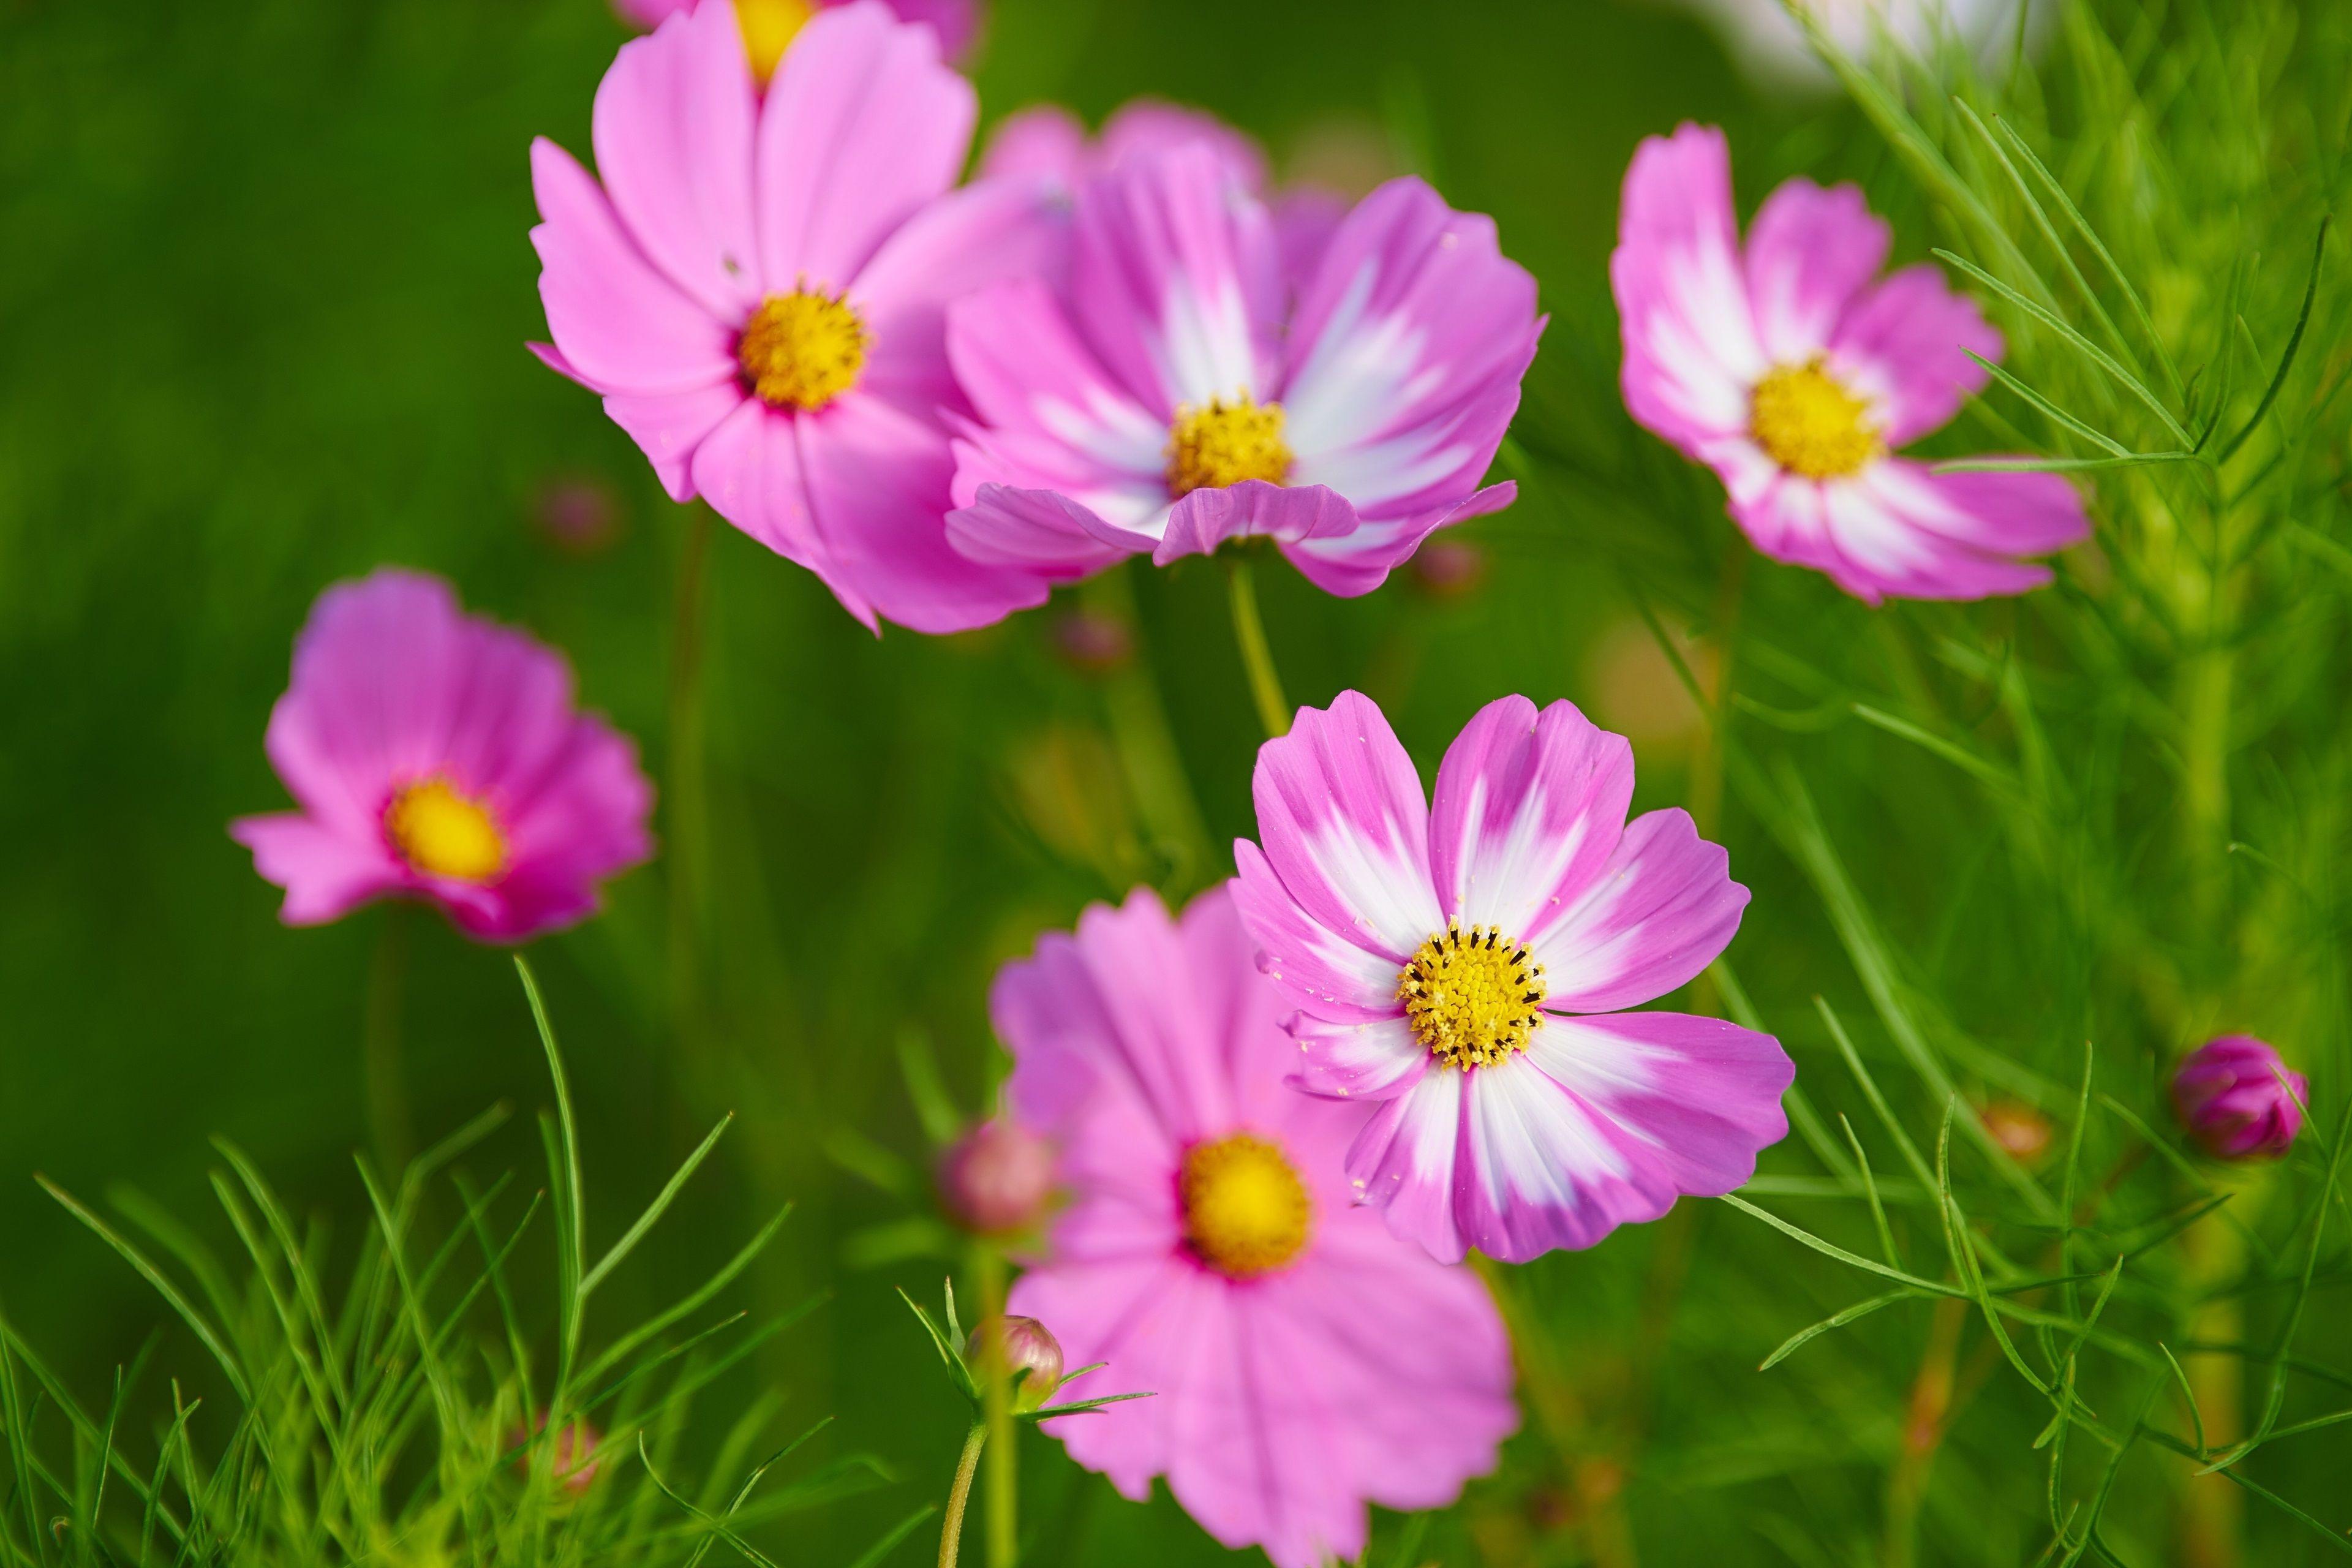 3840x2560 Cosmos Flowers 4k Wallpaper Download Free Cosmos Flowers Hd Flowers Flowers